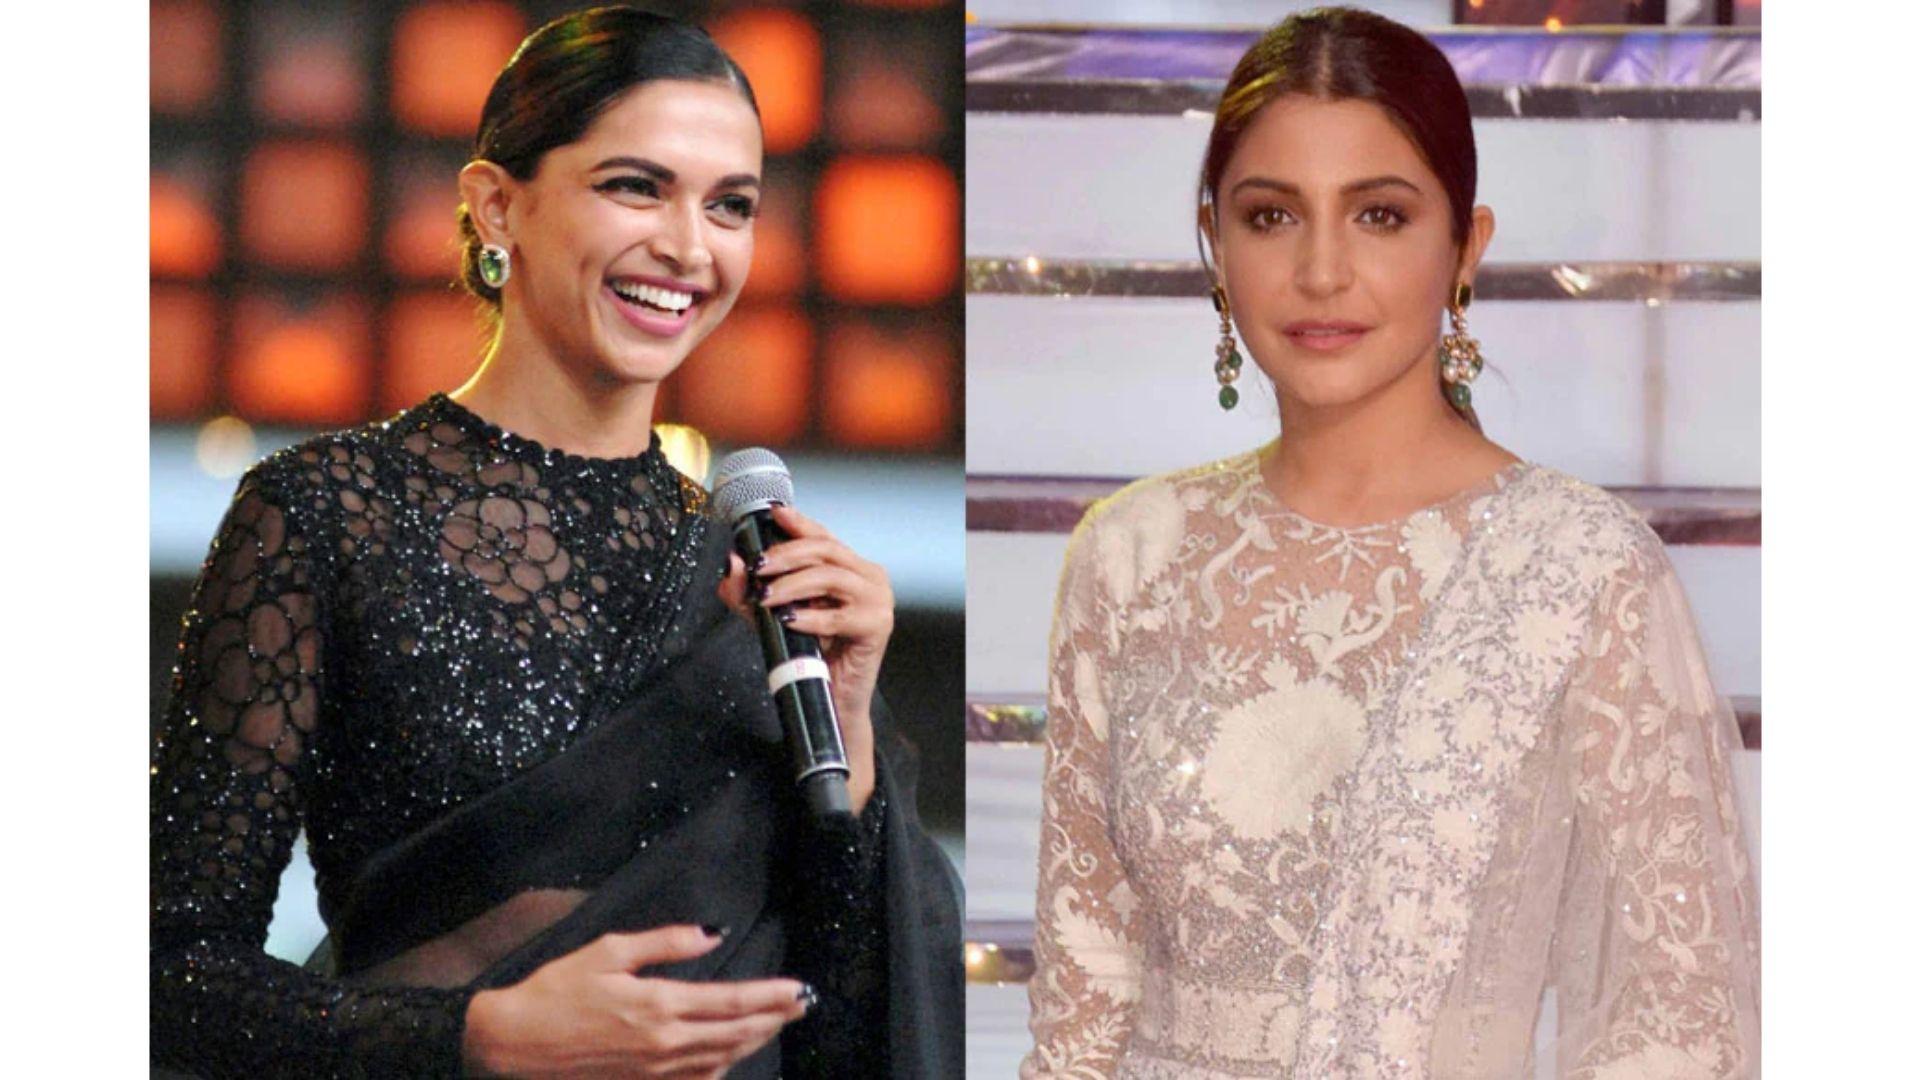 Bollywood Actors Like Anushka Sharma And Deepika Padukone Who Said Mean Things To Each Other